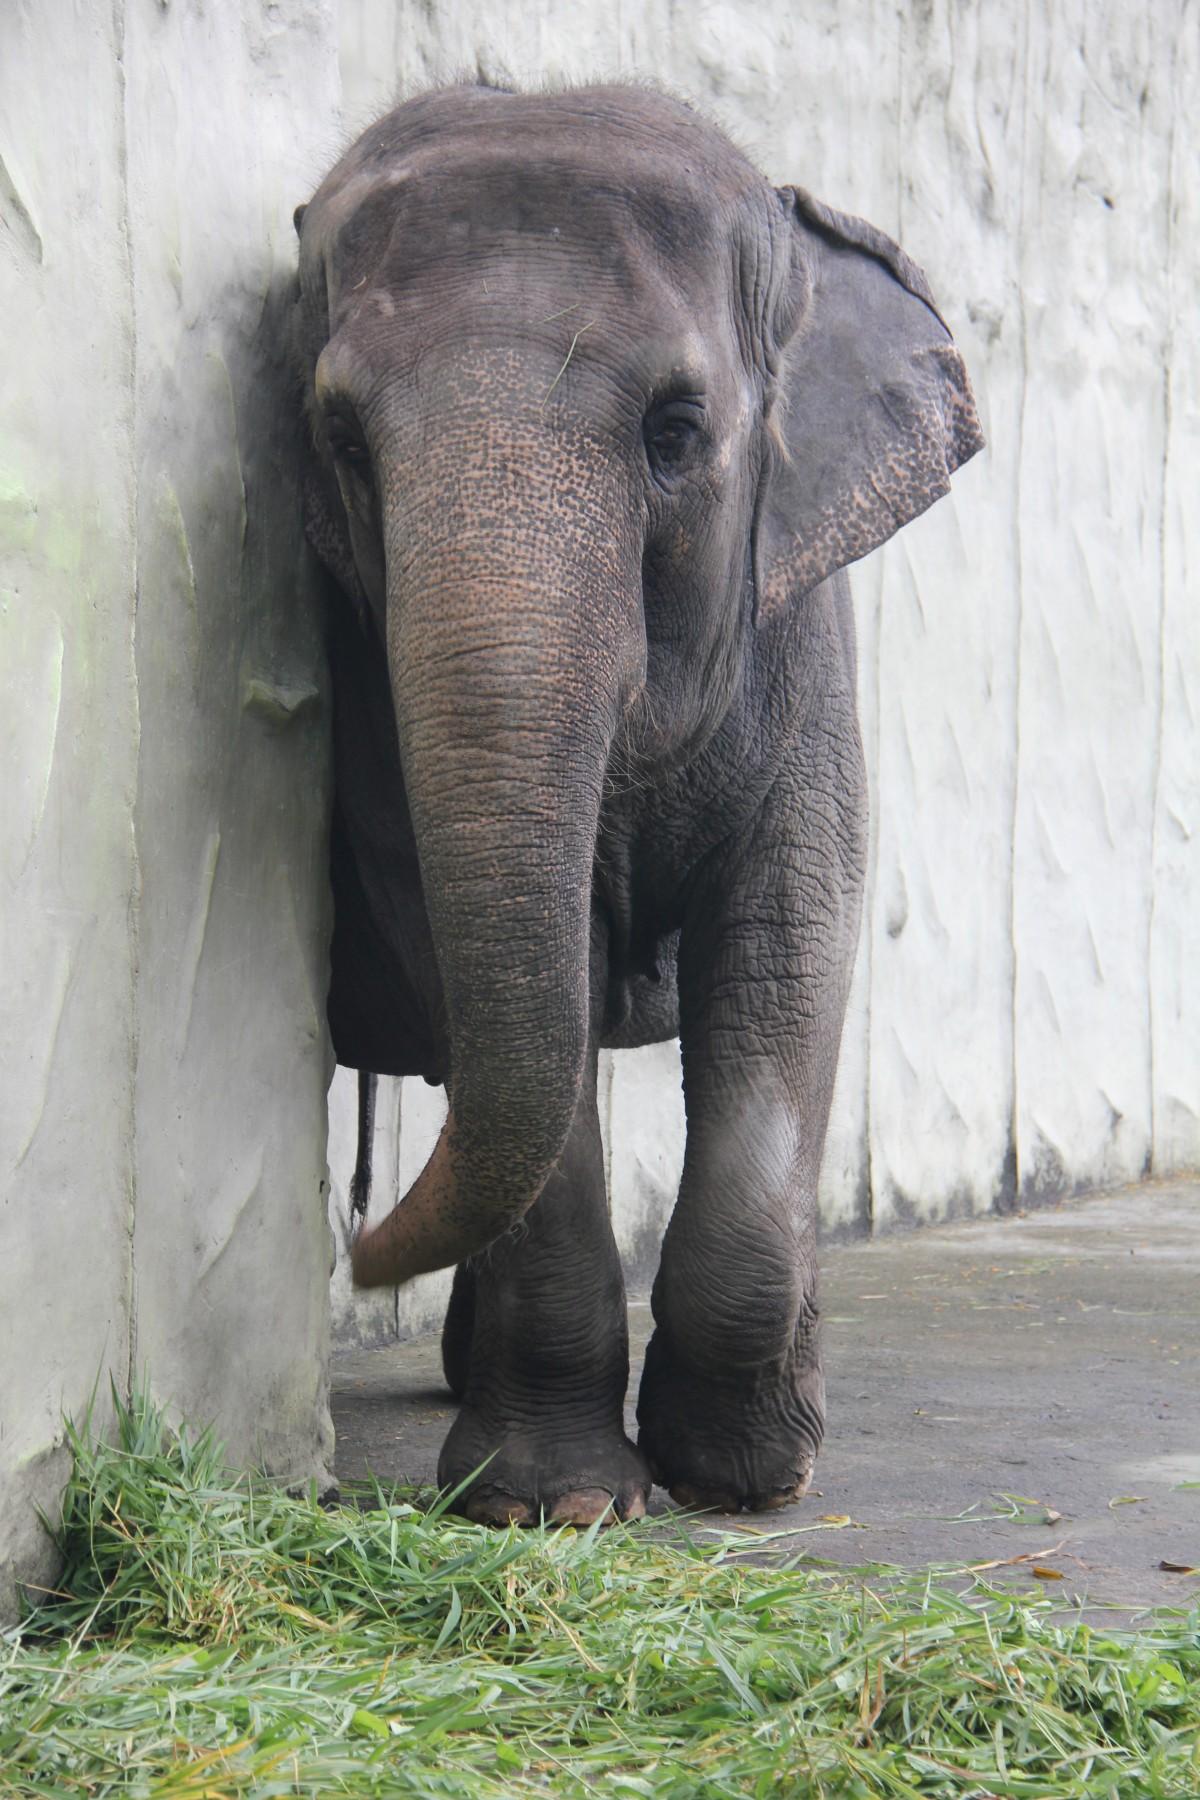 Mali, Manila Zoo